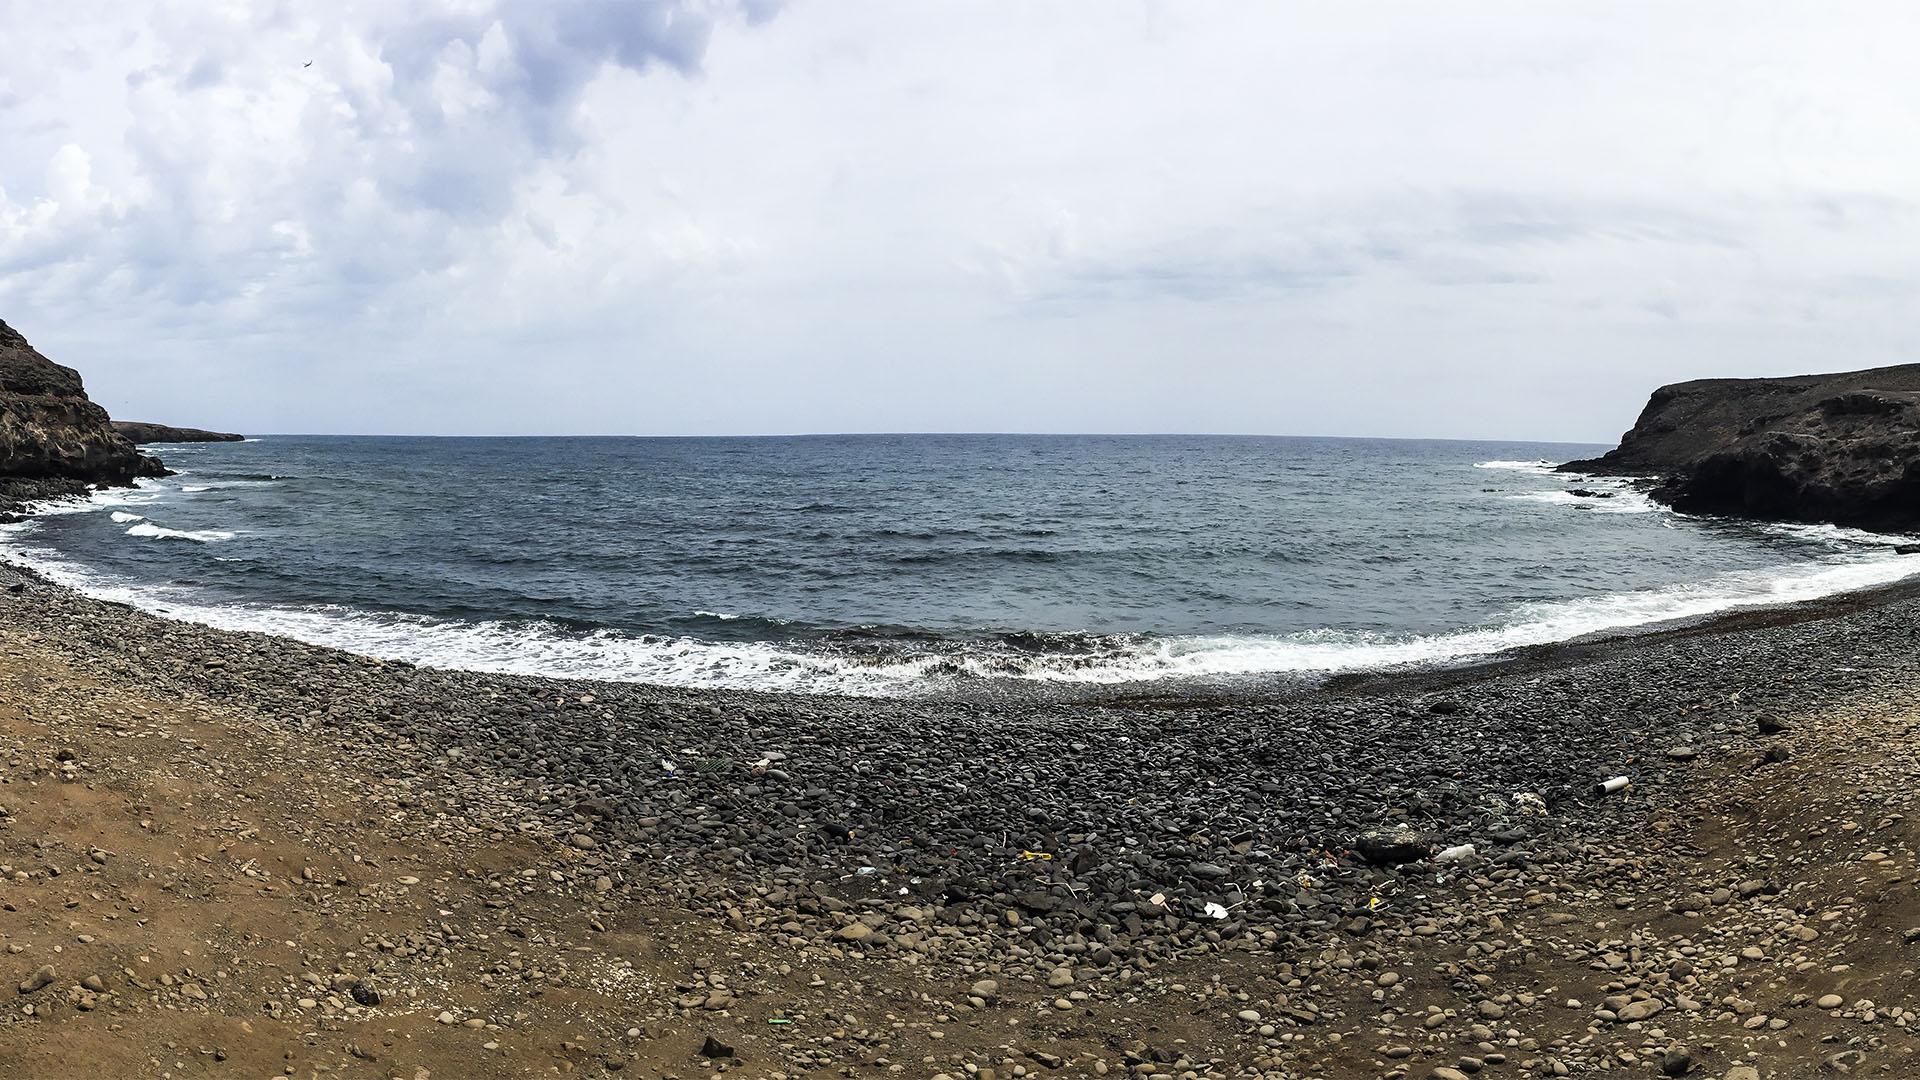 Die Strände Fuerteventuras: Playa de Leandro